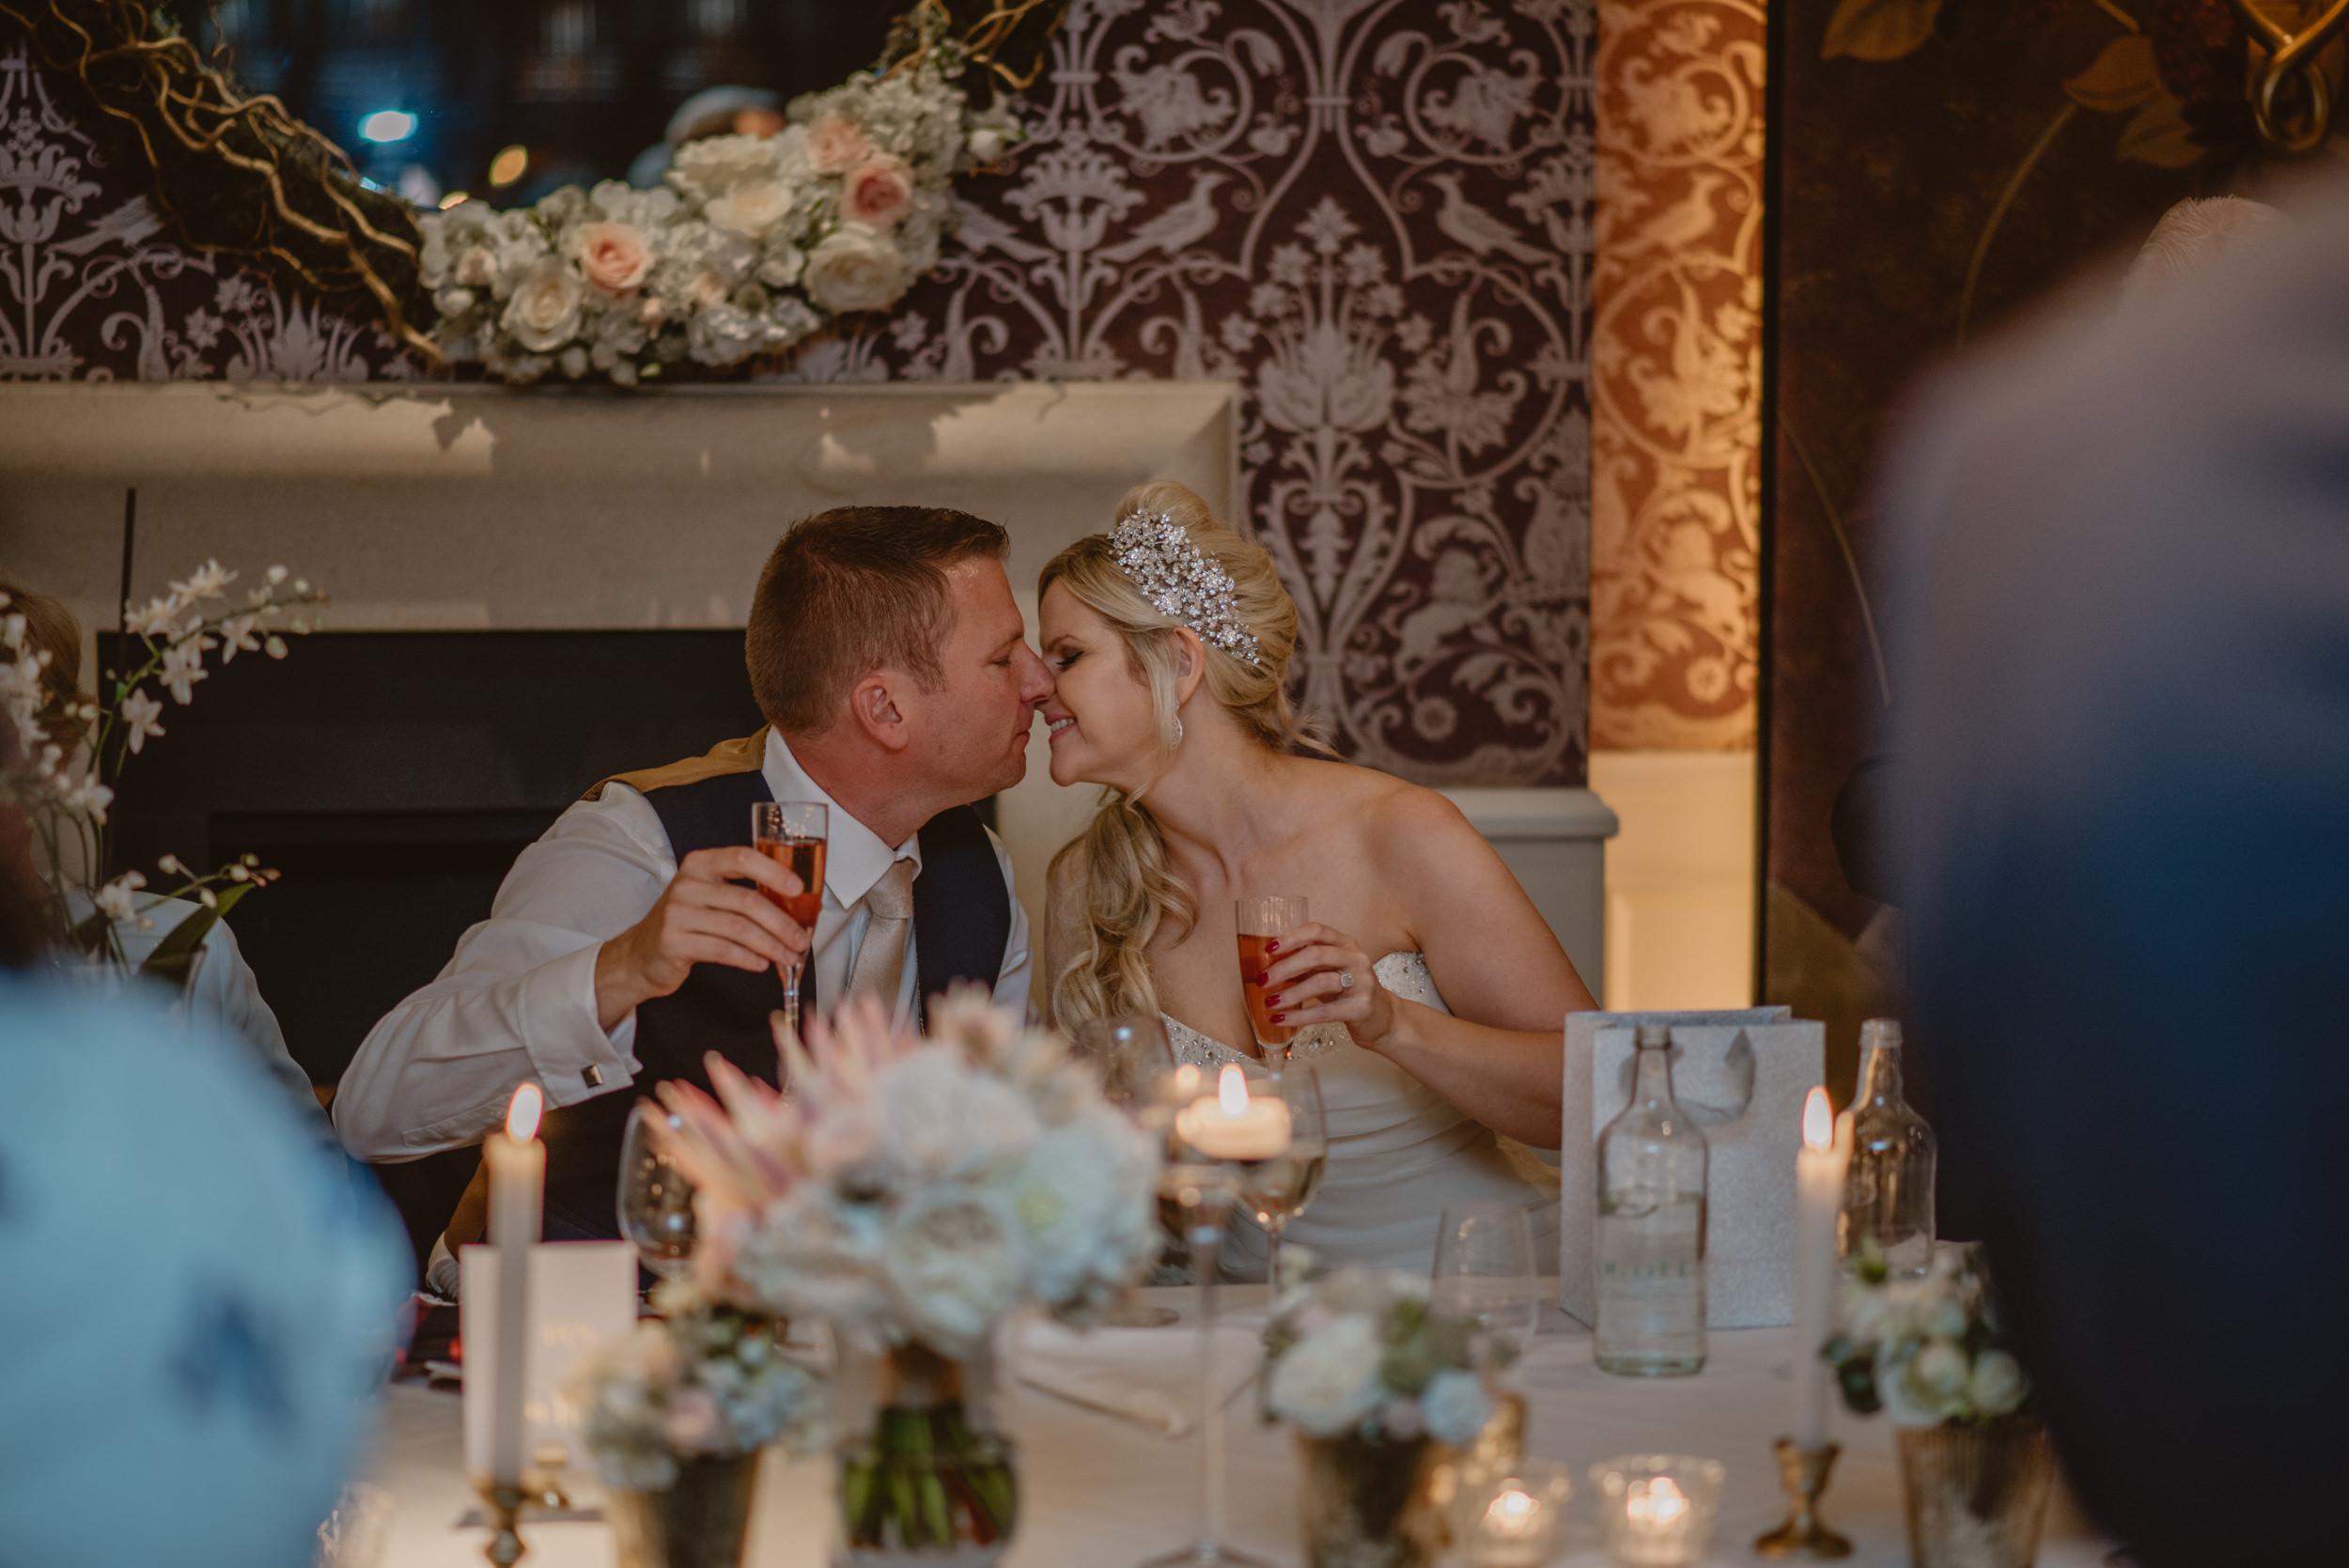 Trisha-and-Roger-wedding-The-Priory-Church-and-Chewton-Glen-Hotel-Christchurch-Manu-Mendoza-Wedding-Photography-468.jpg